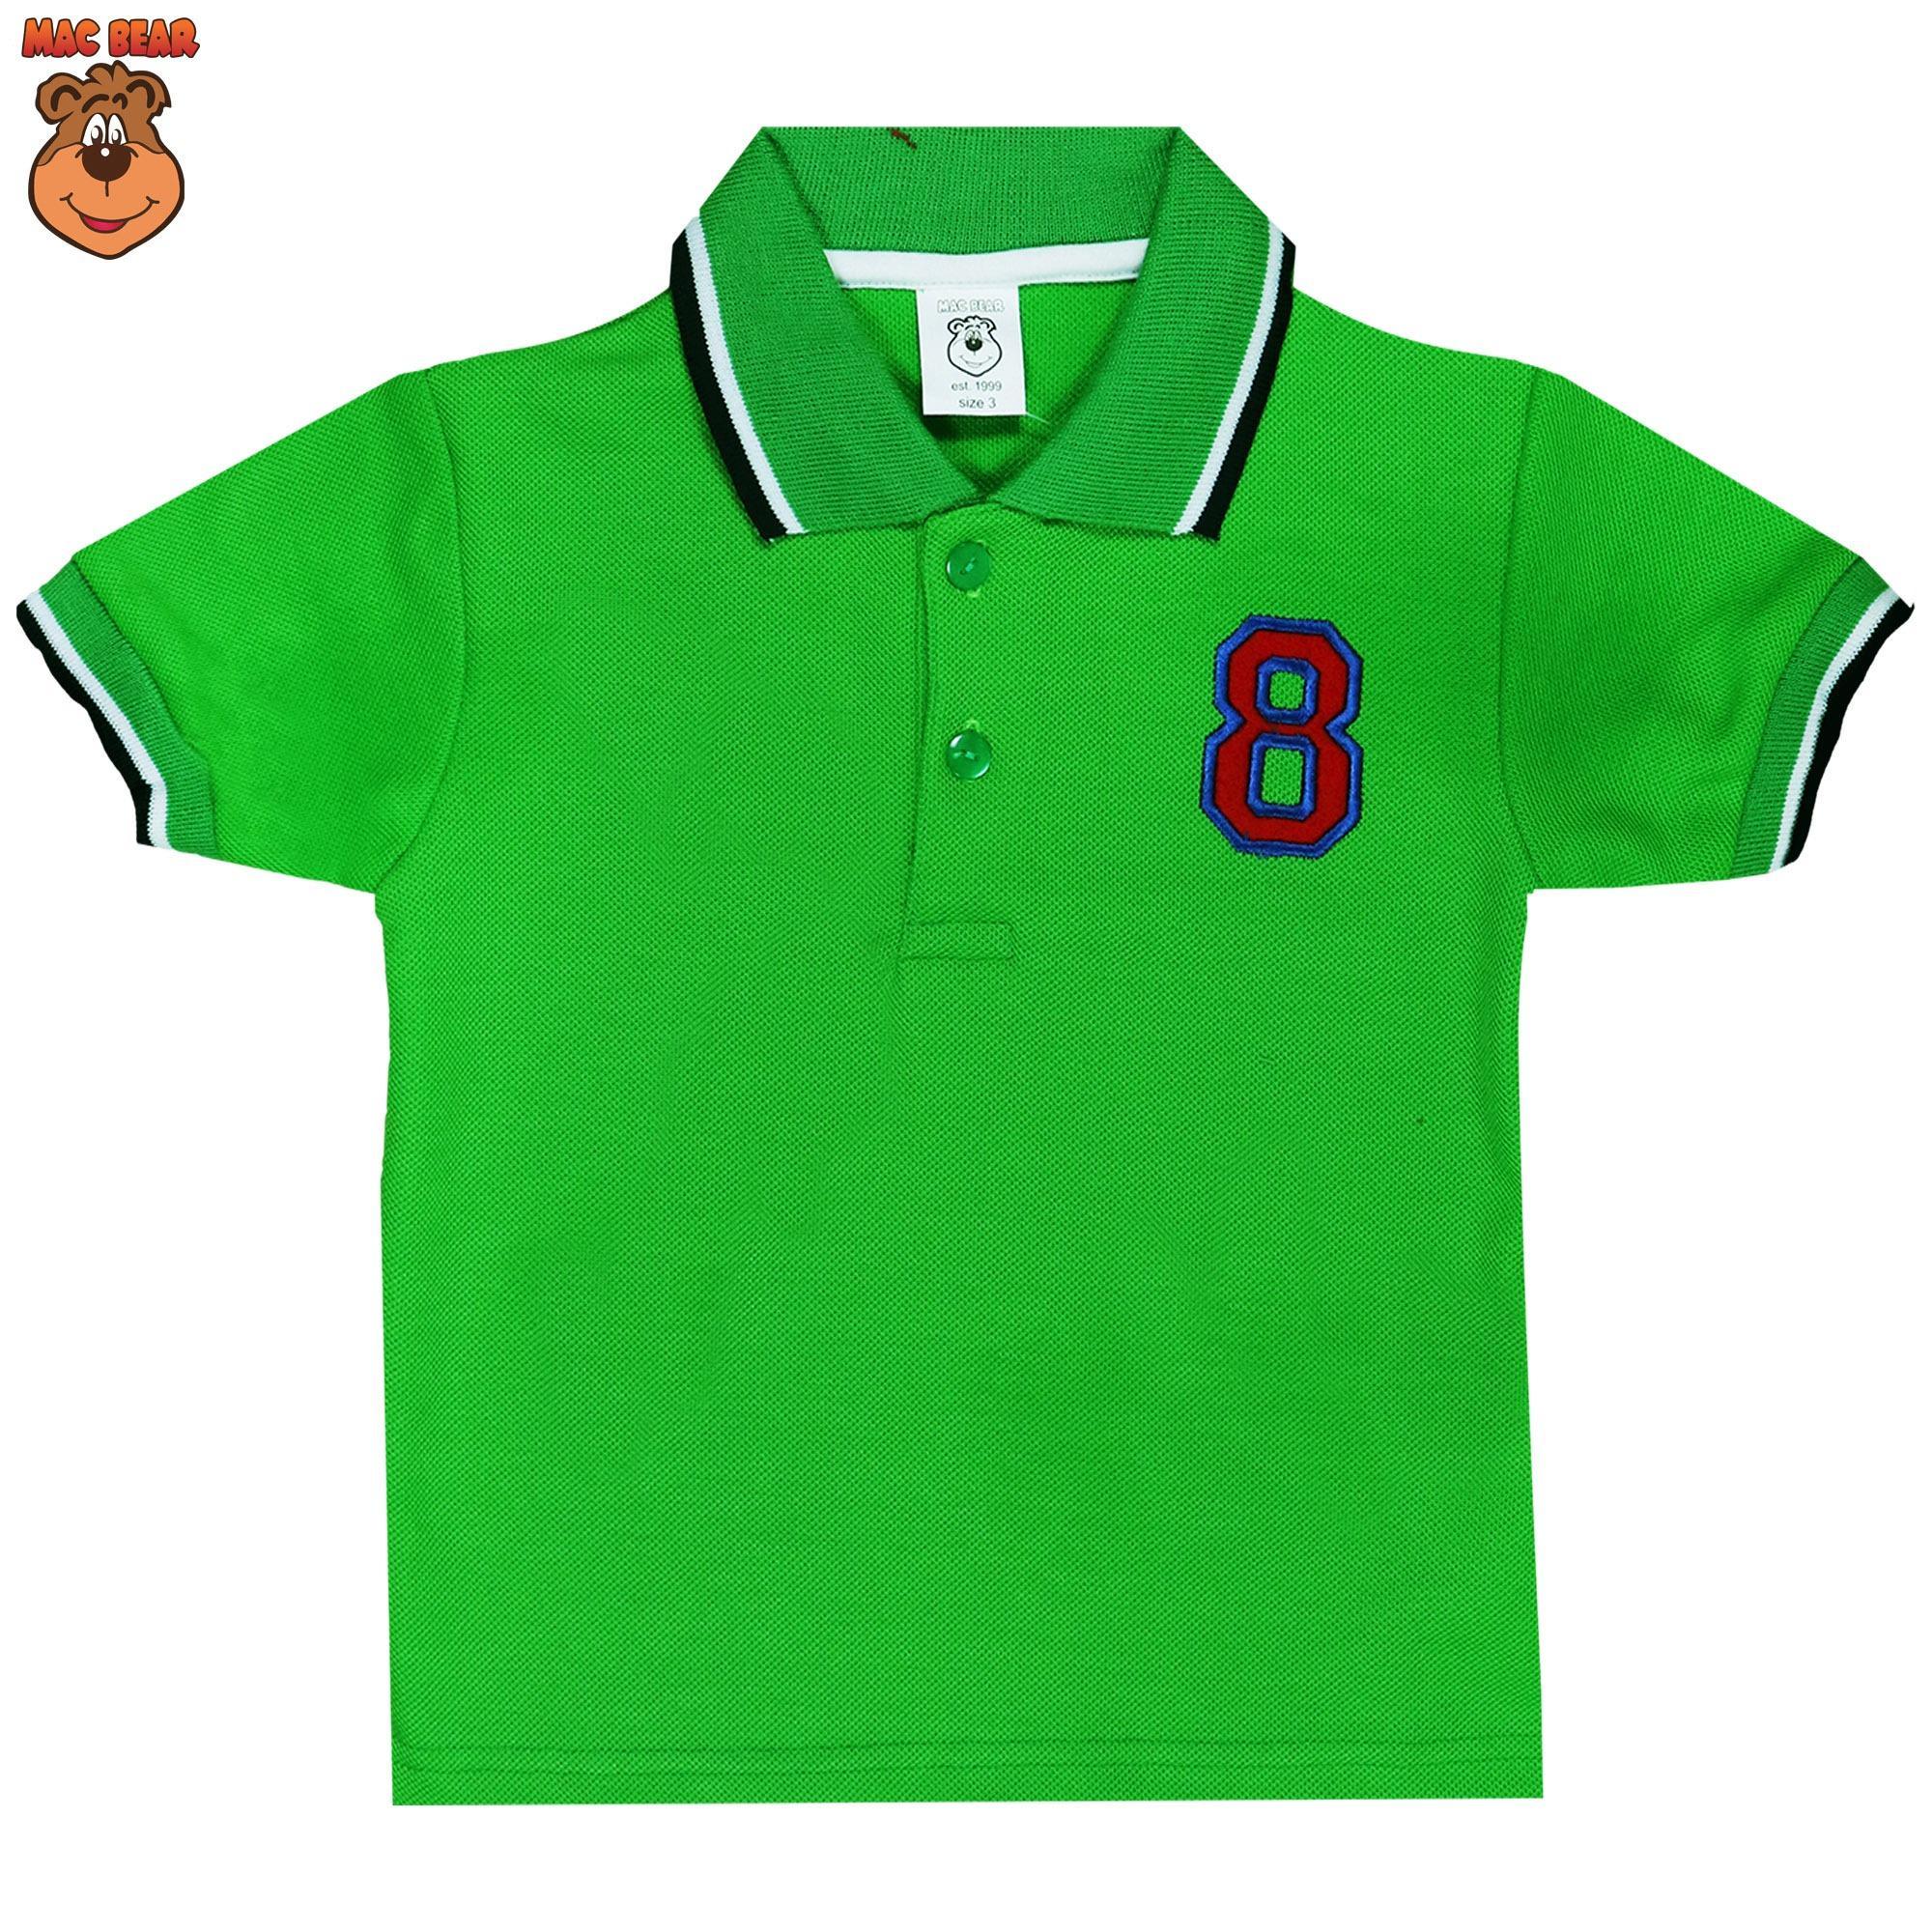 Macbear Baju Polo Anak M For White Stripes On Yellow Size 3 Hx5 1710 Kids Setelan Boss Panda 4 Abu Muda Home